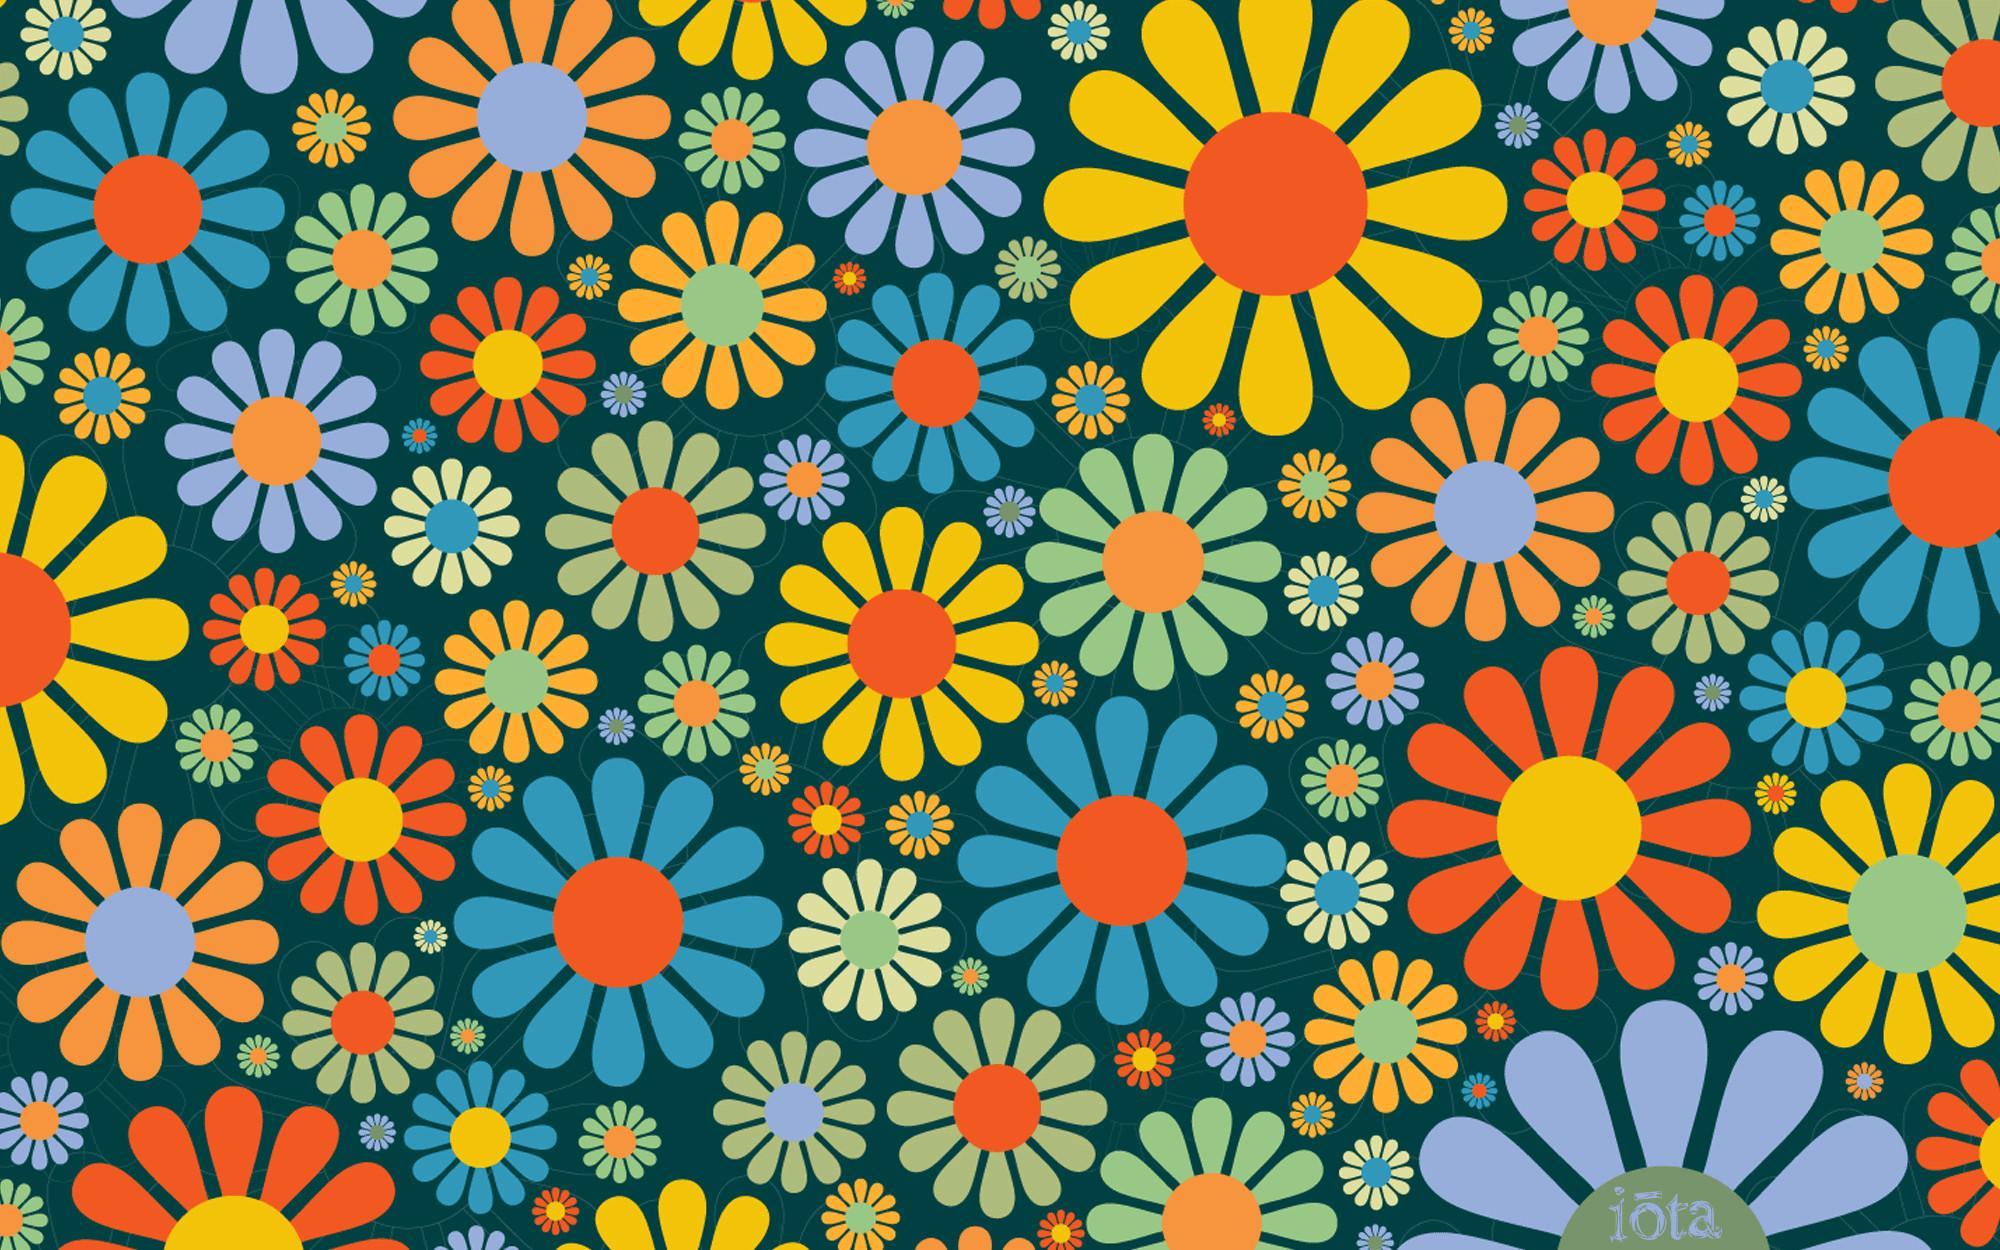 70s Wallpaper – Bring Back the Magic of the Postwar Years